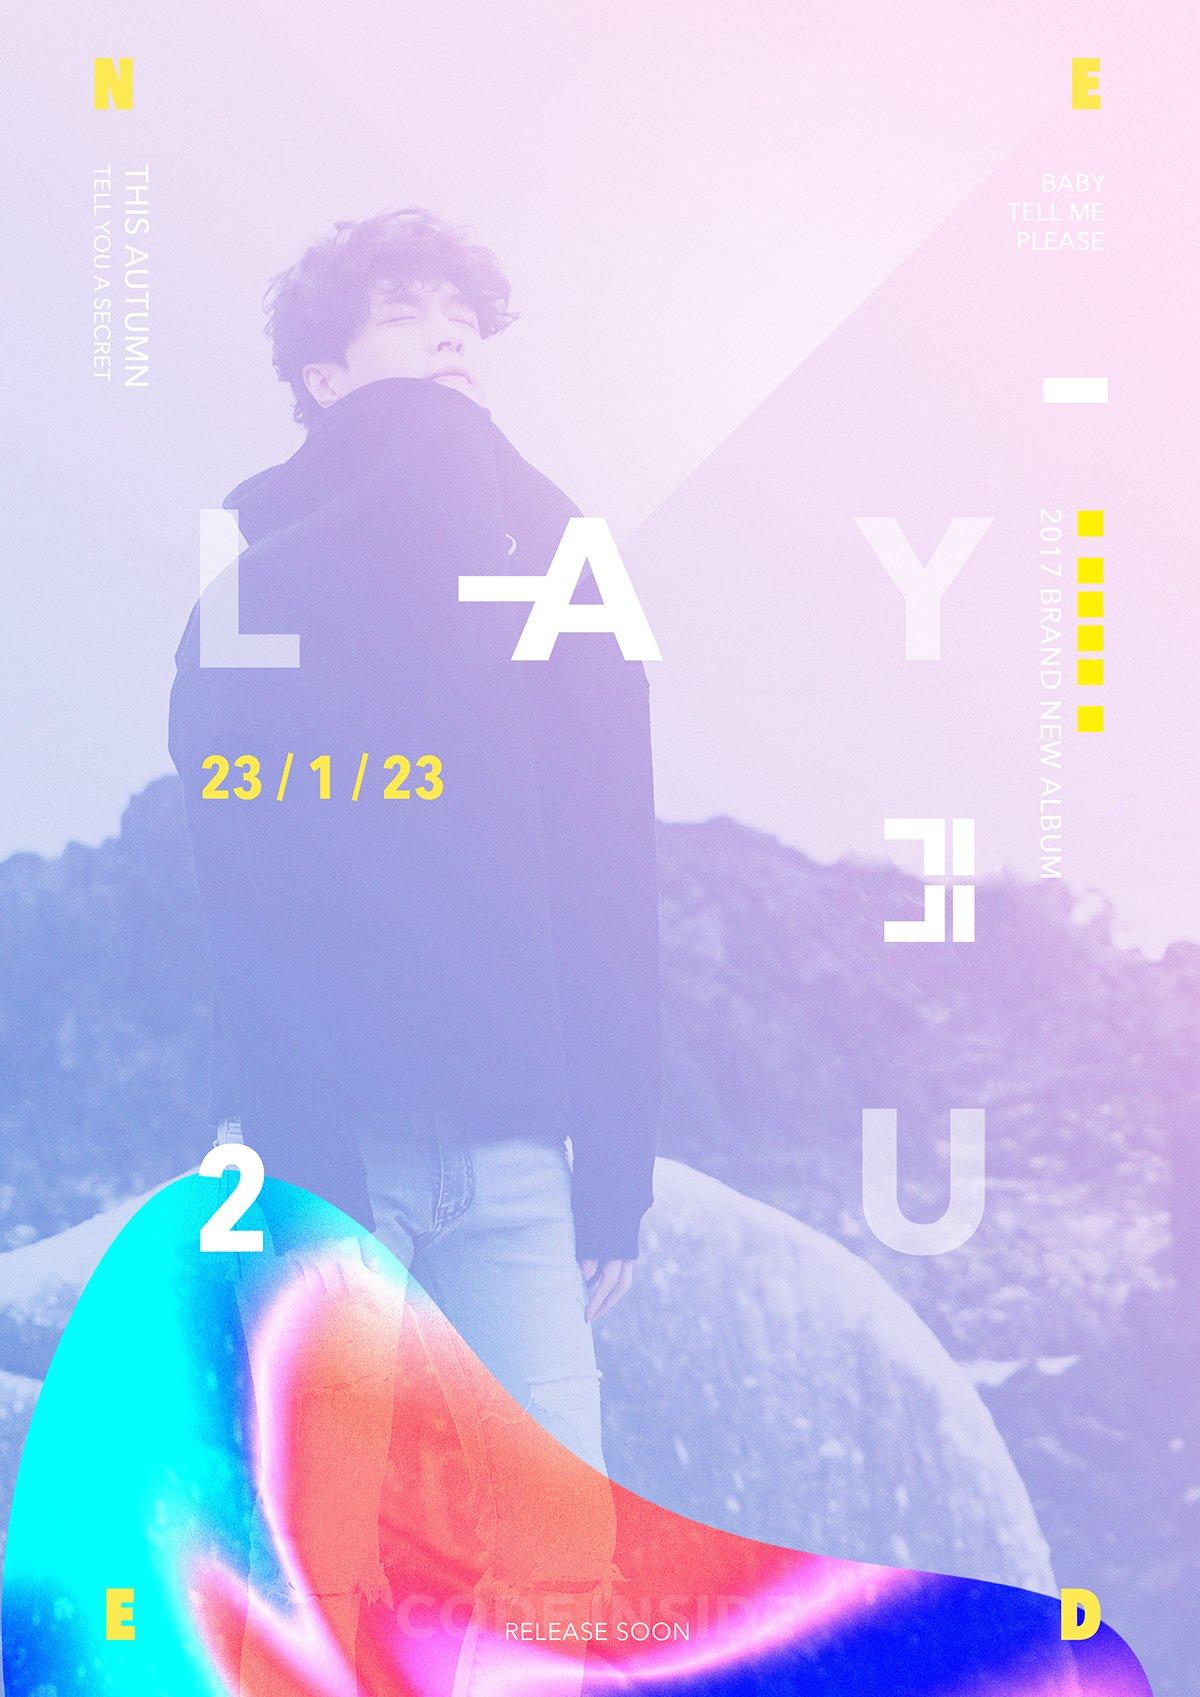 #LAY(#张艺兴) CODE - 2  #EXO(@weareoneEXO) https://t.co/ayYVv5uzog